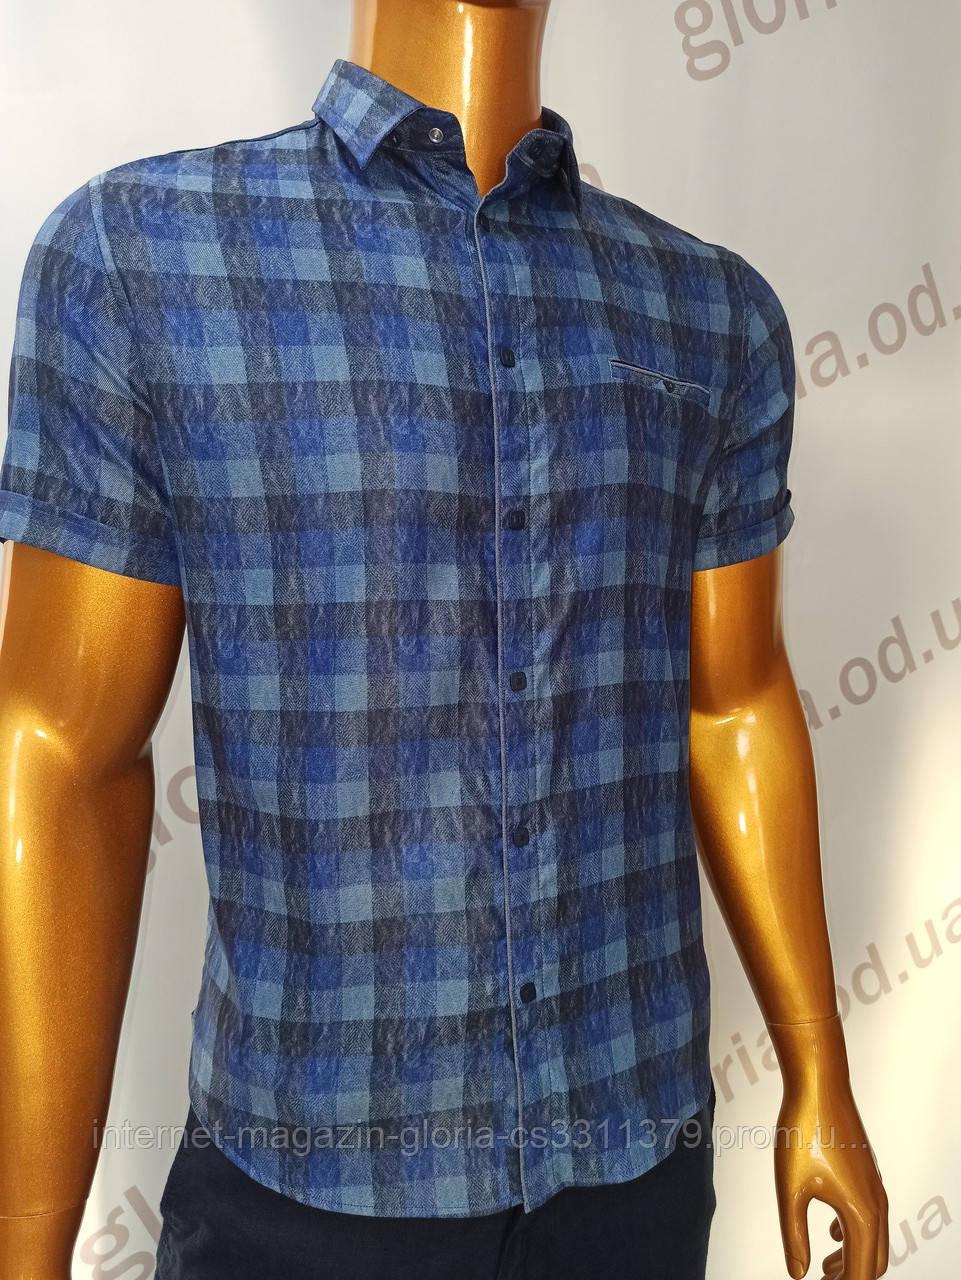 Мужская рубашка Amato. AG.KG19585(s). Размеры: L,XL(2),XXL.